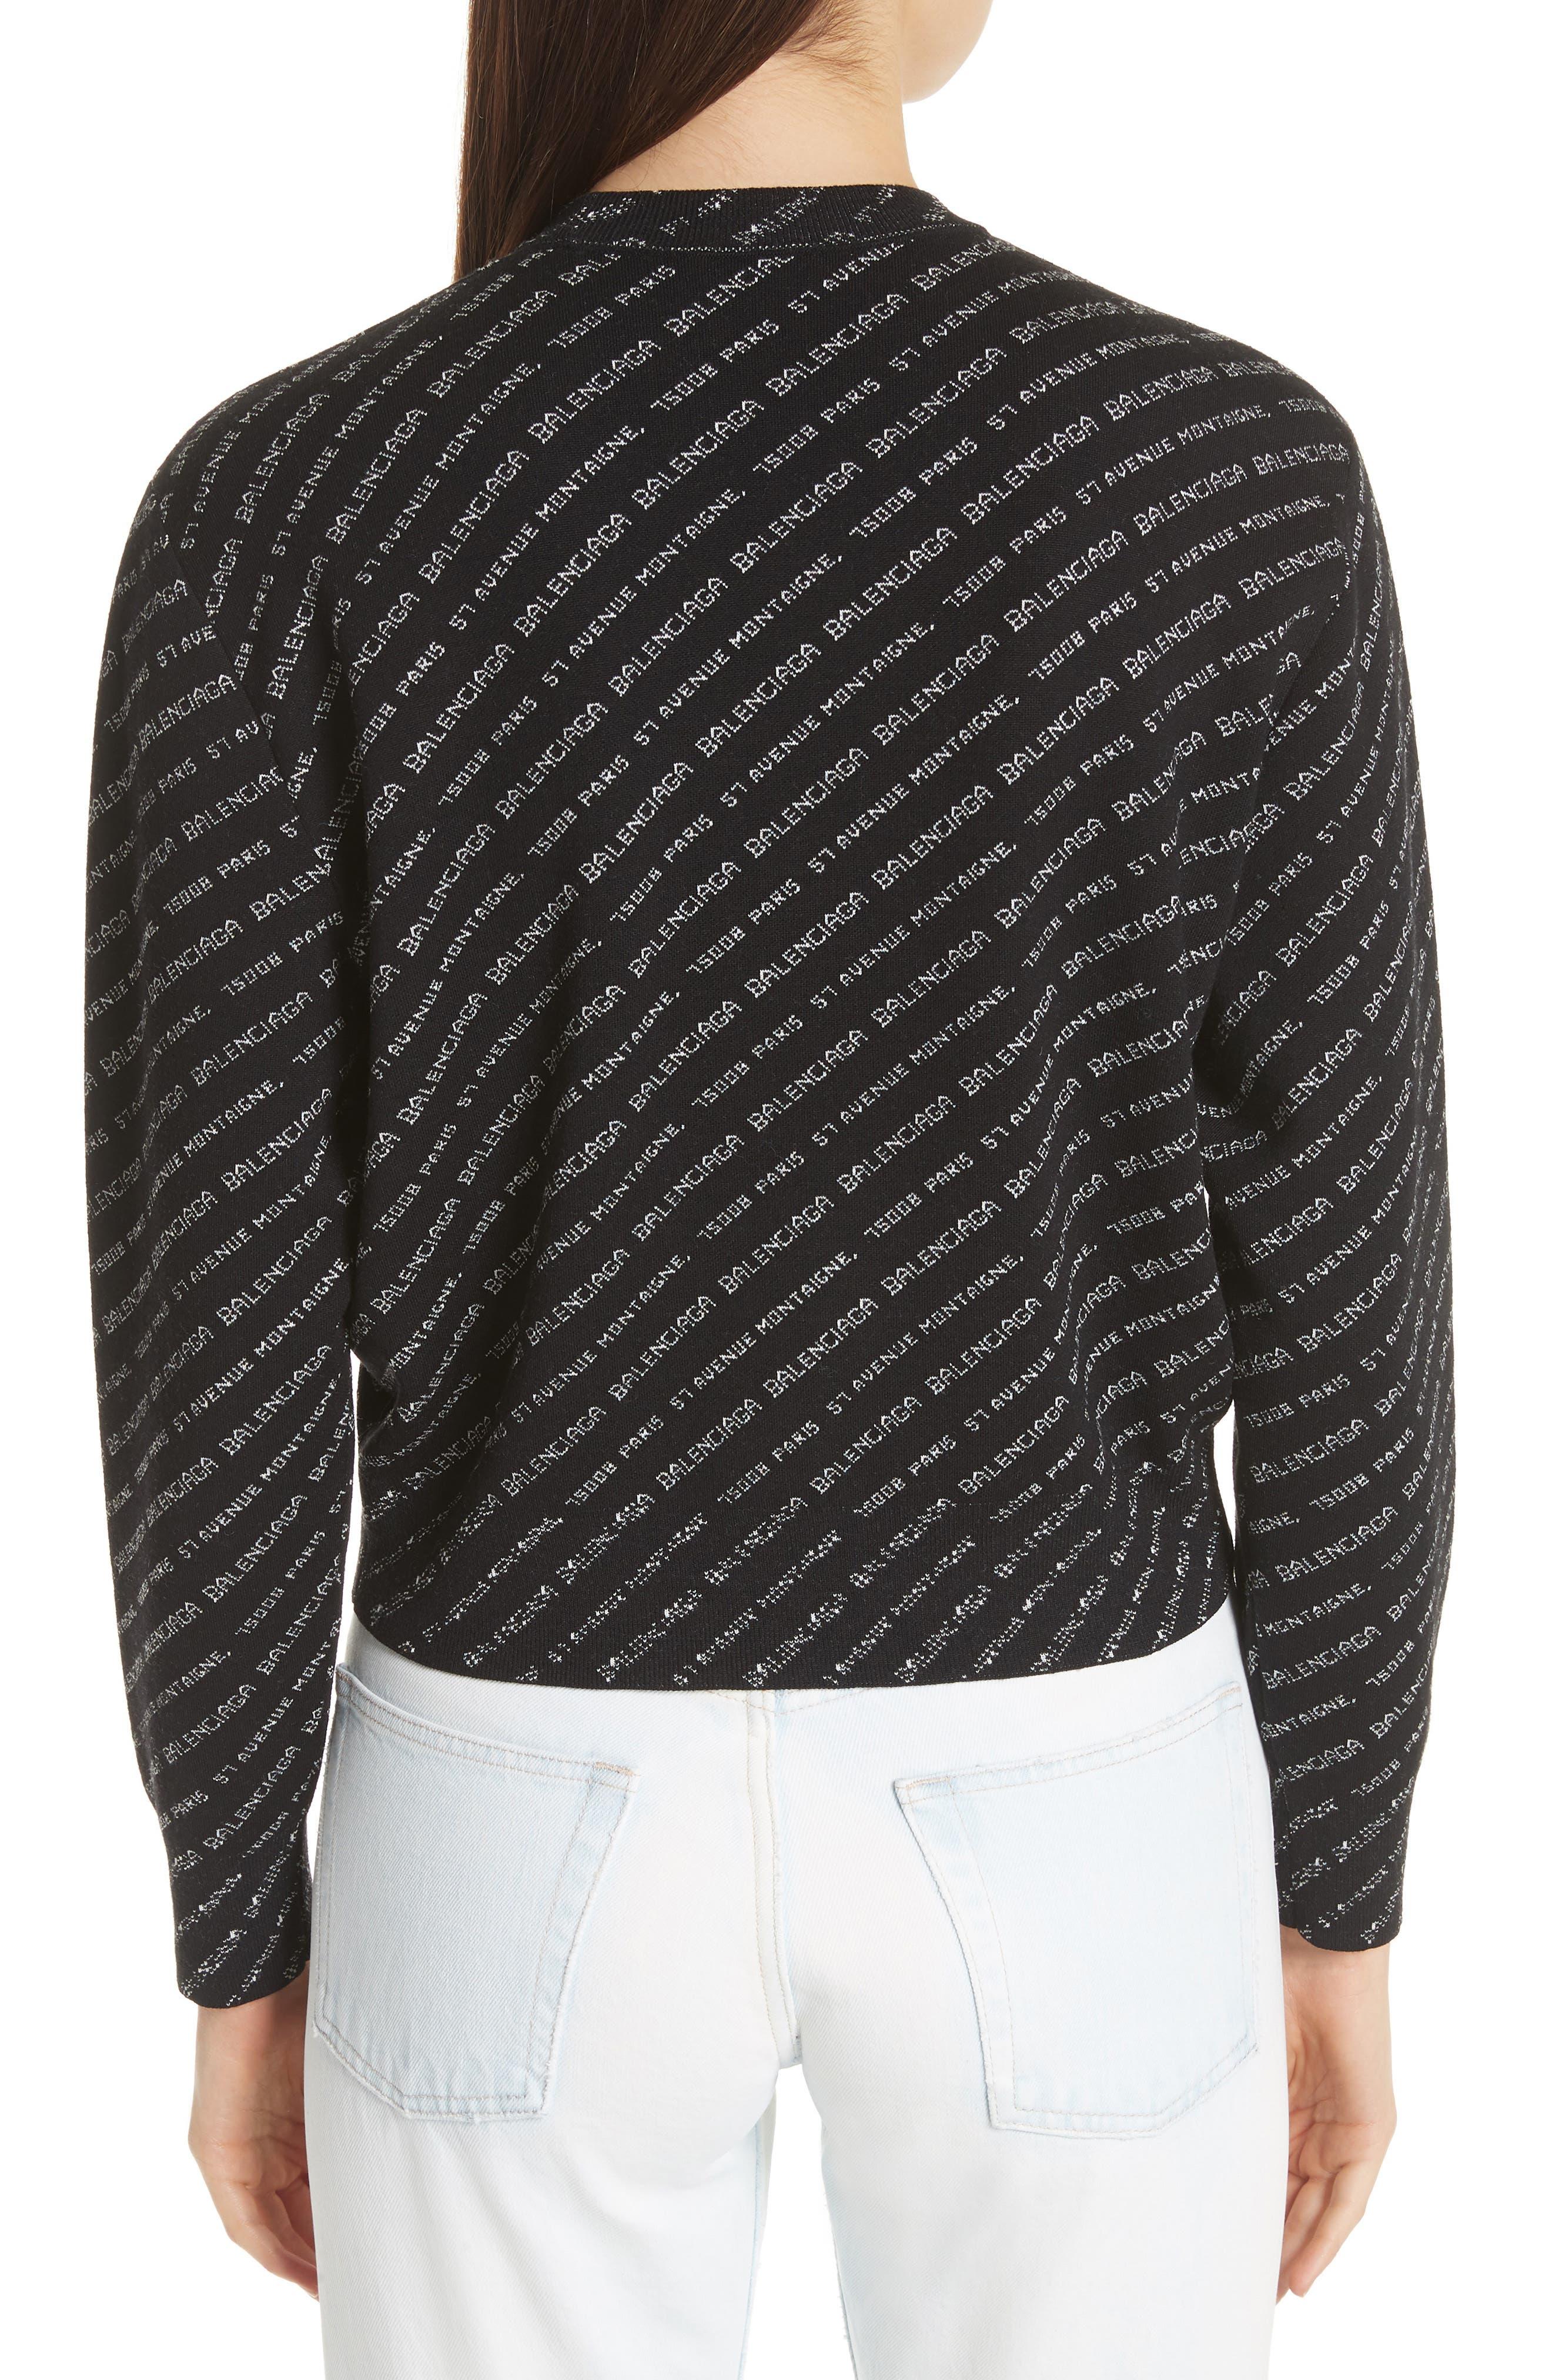 BALENCIAGA,                             Logo Knit Sweater,                             Alternate thumbnail 2, color,                             001